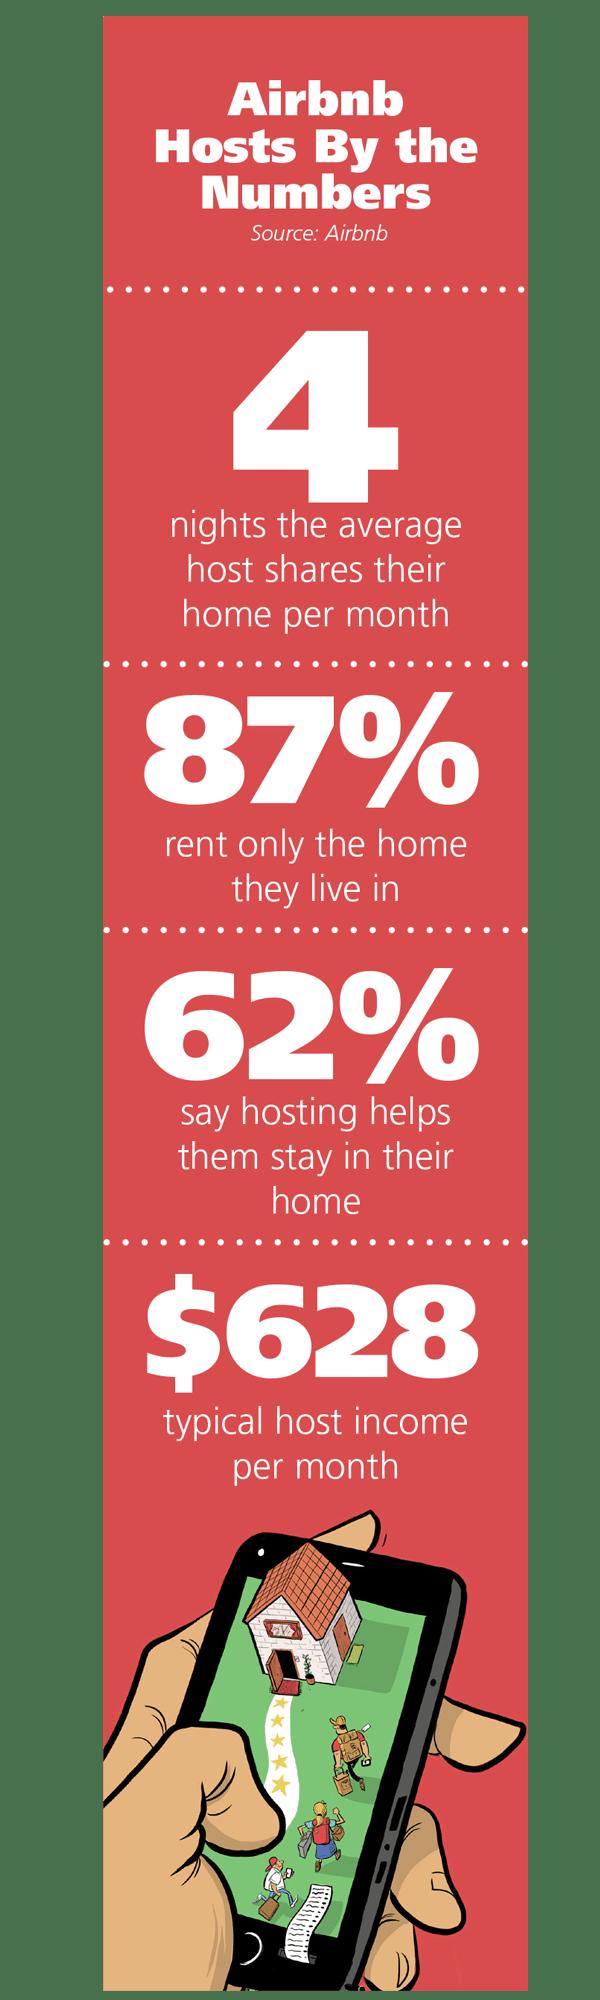 Mi Casa, Su Casa: Home Sharing and the Taxman